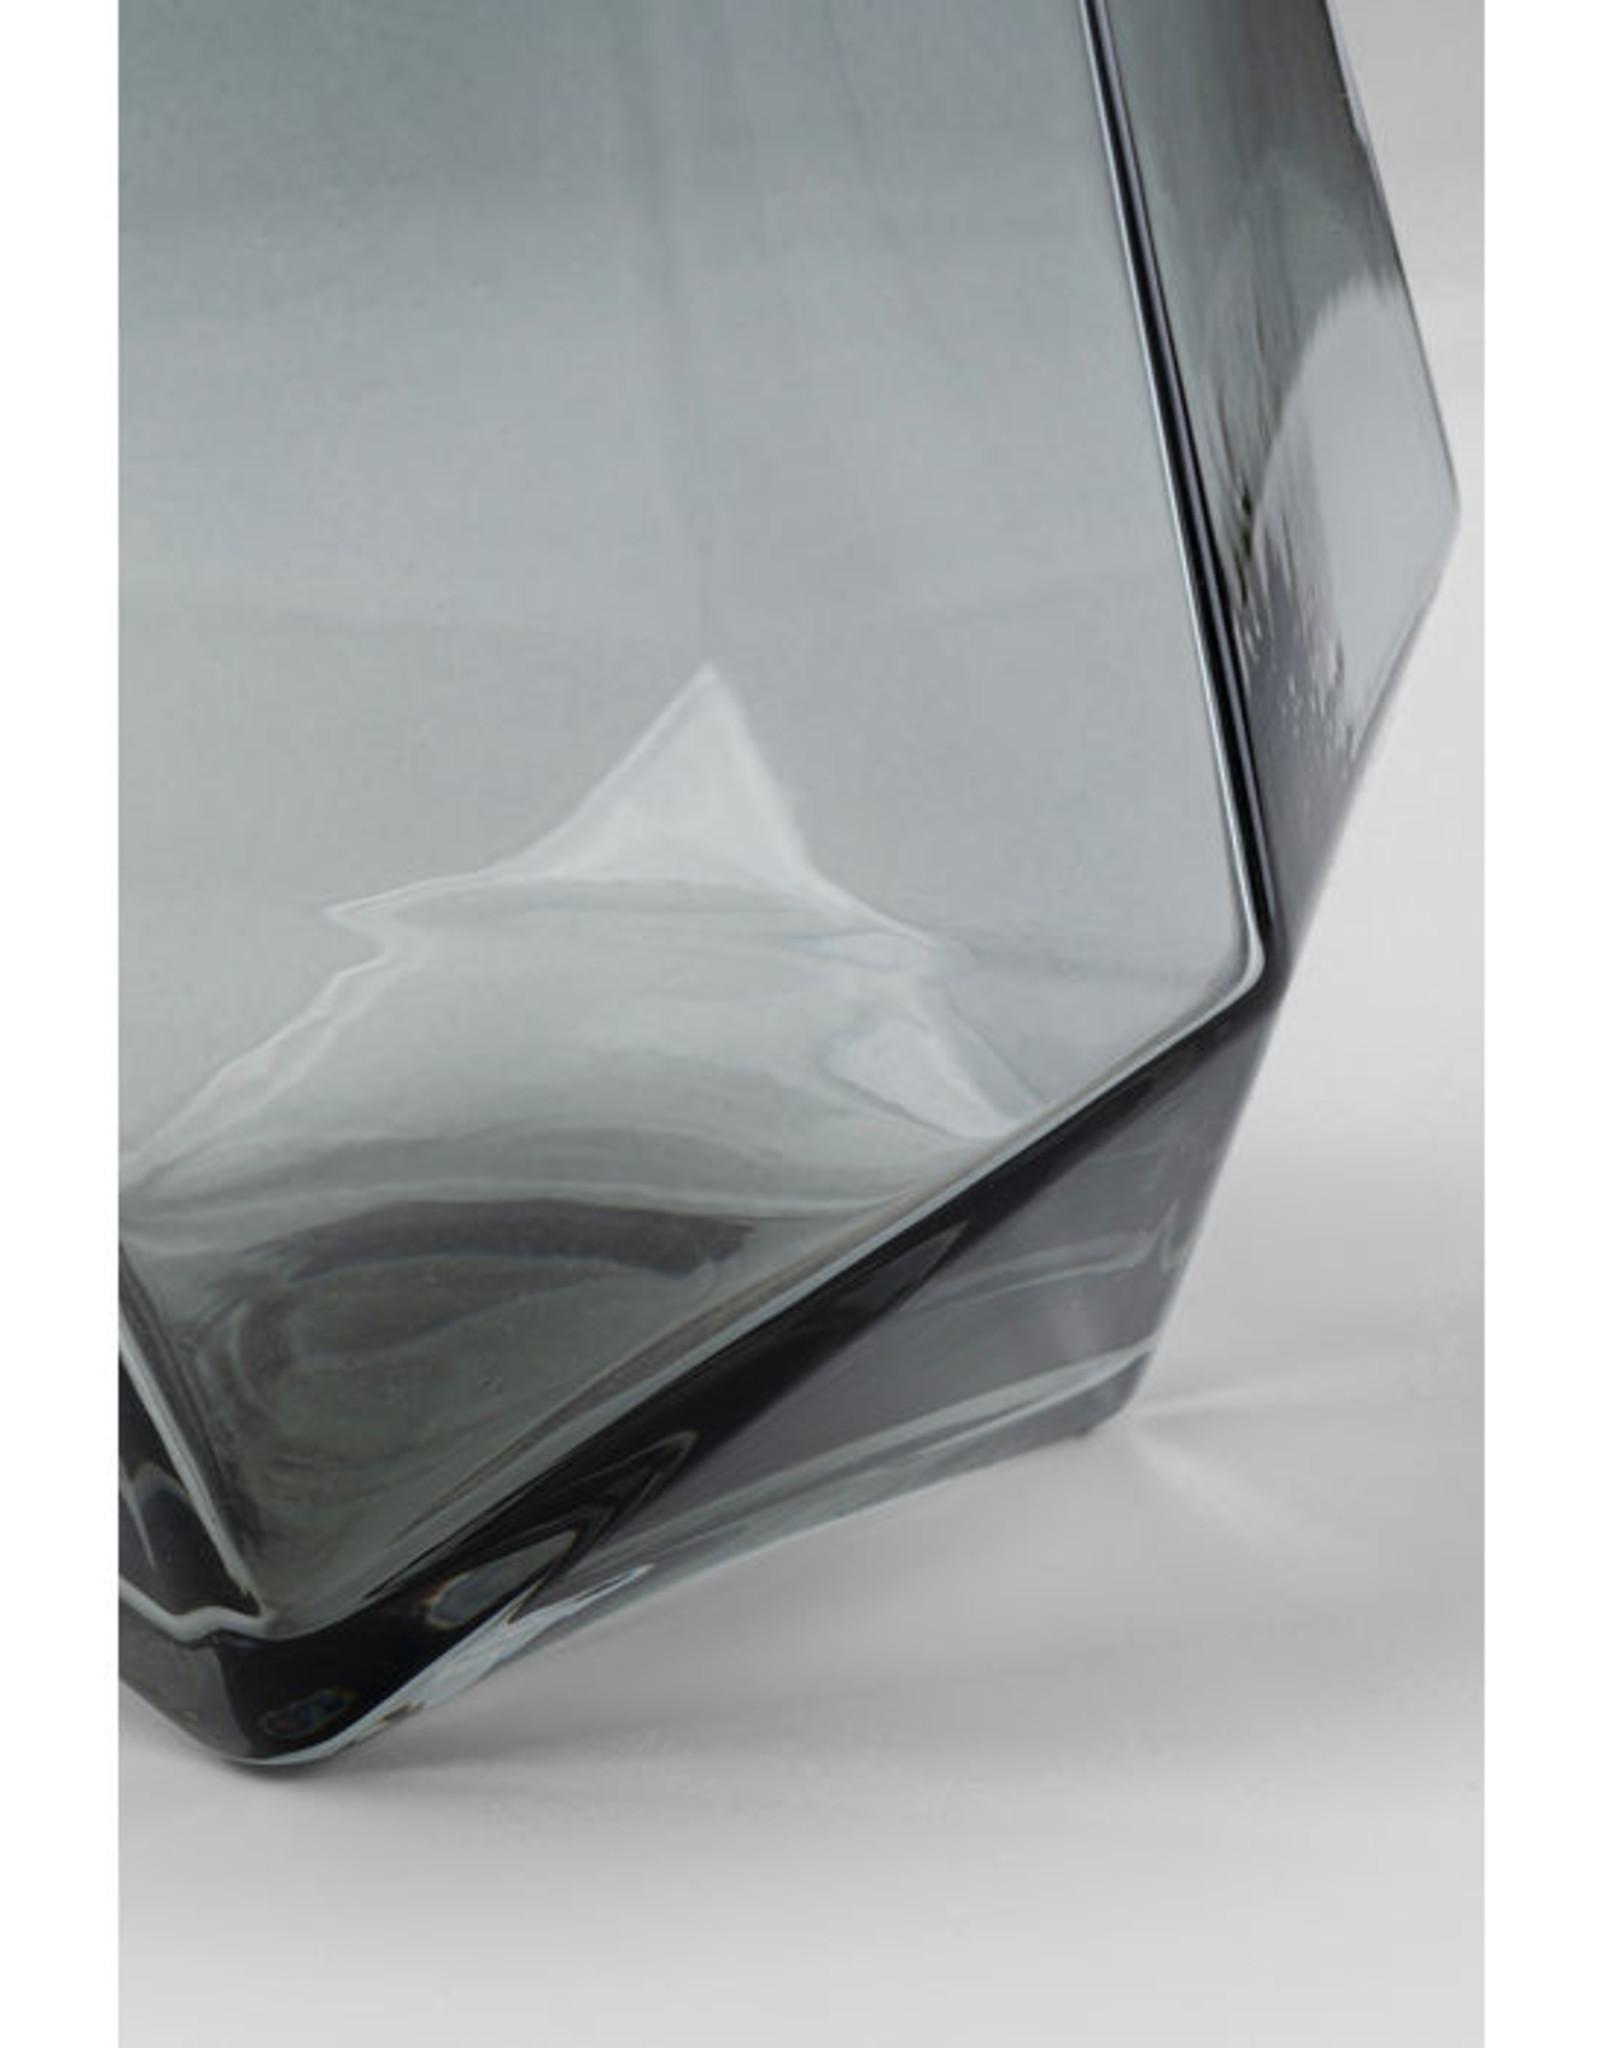 KARE DESIGN Tumbler Diamond Smoke